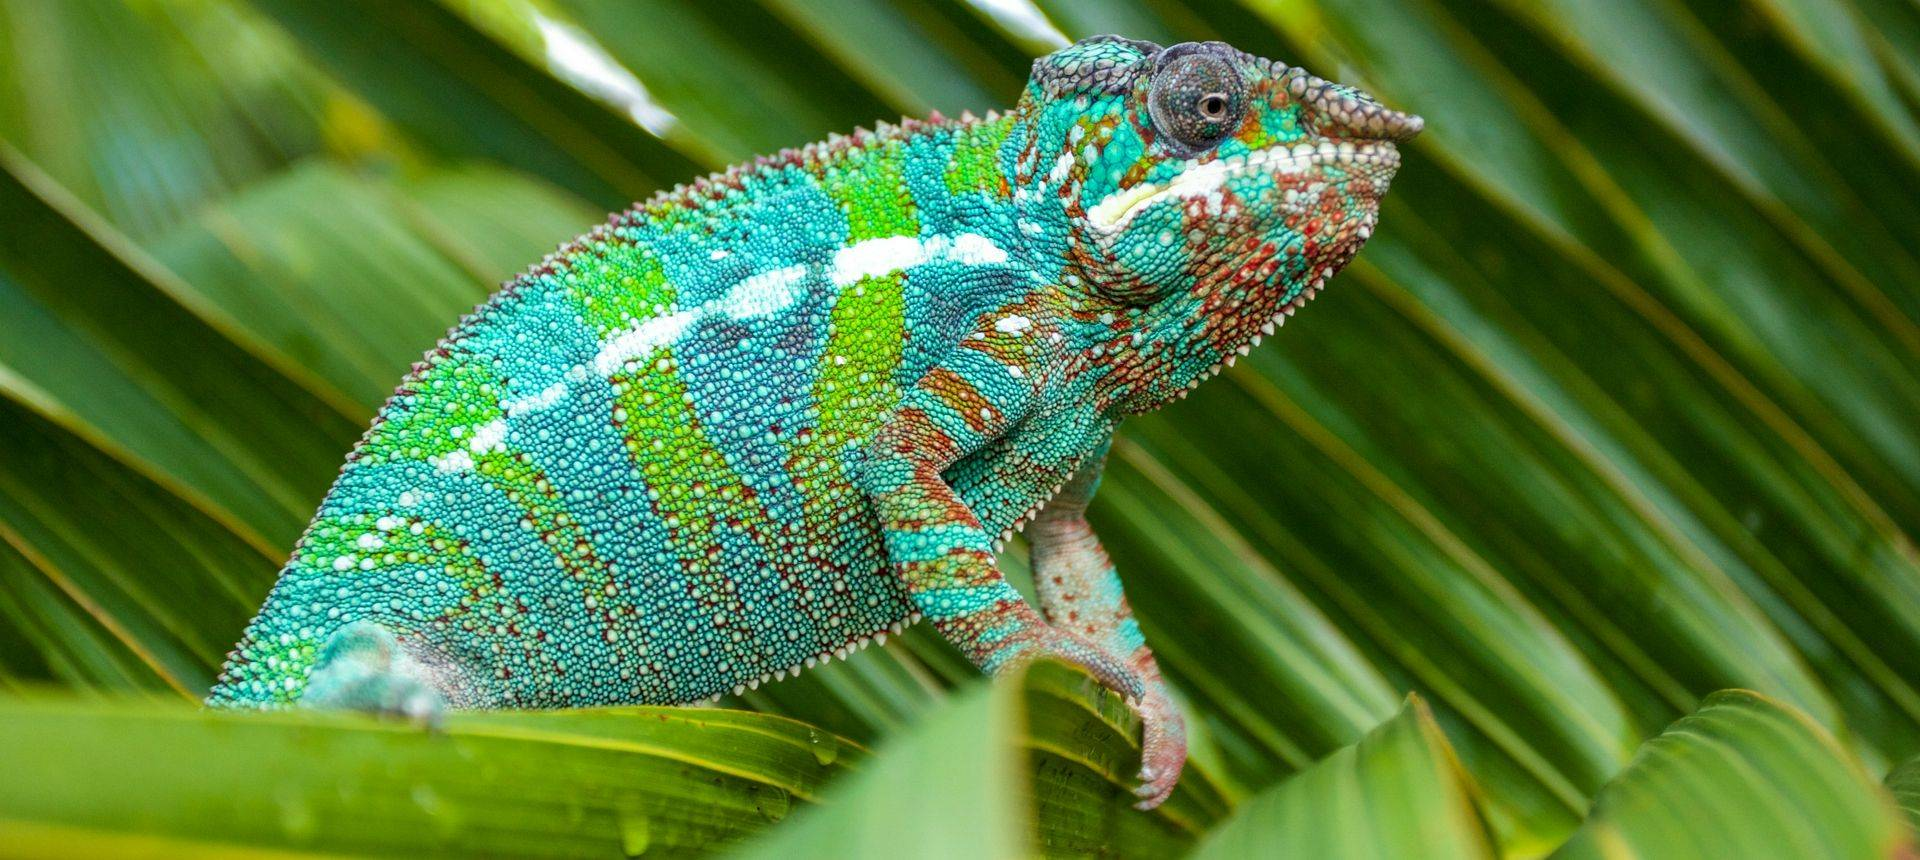 Panther Chameleon, Shutterstock 562425904